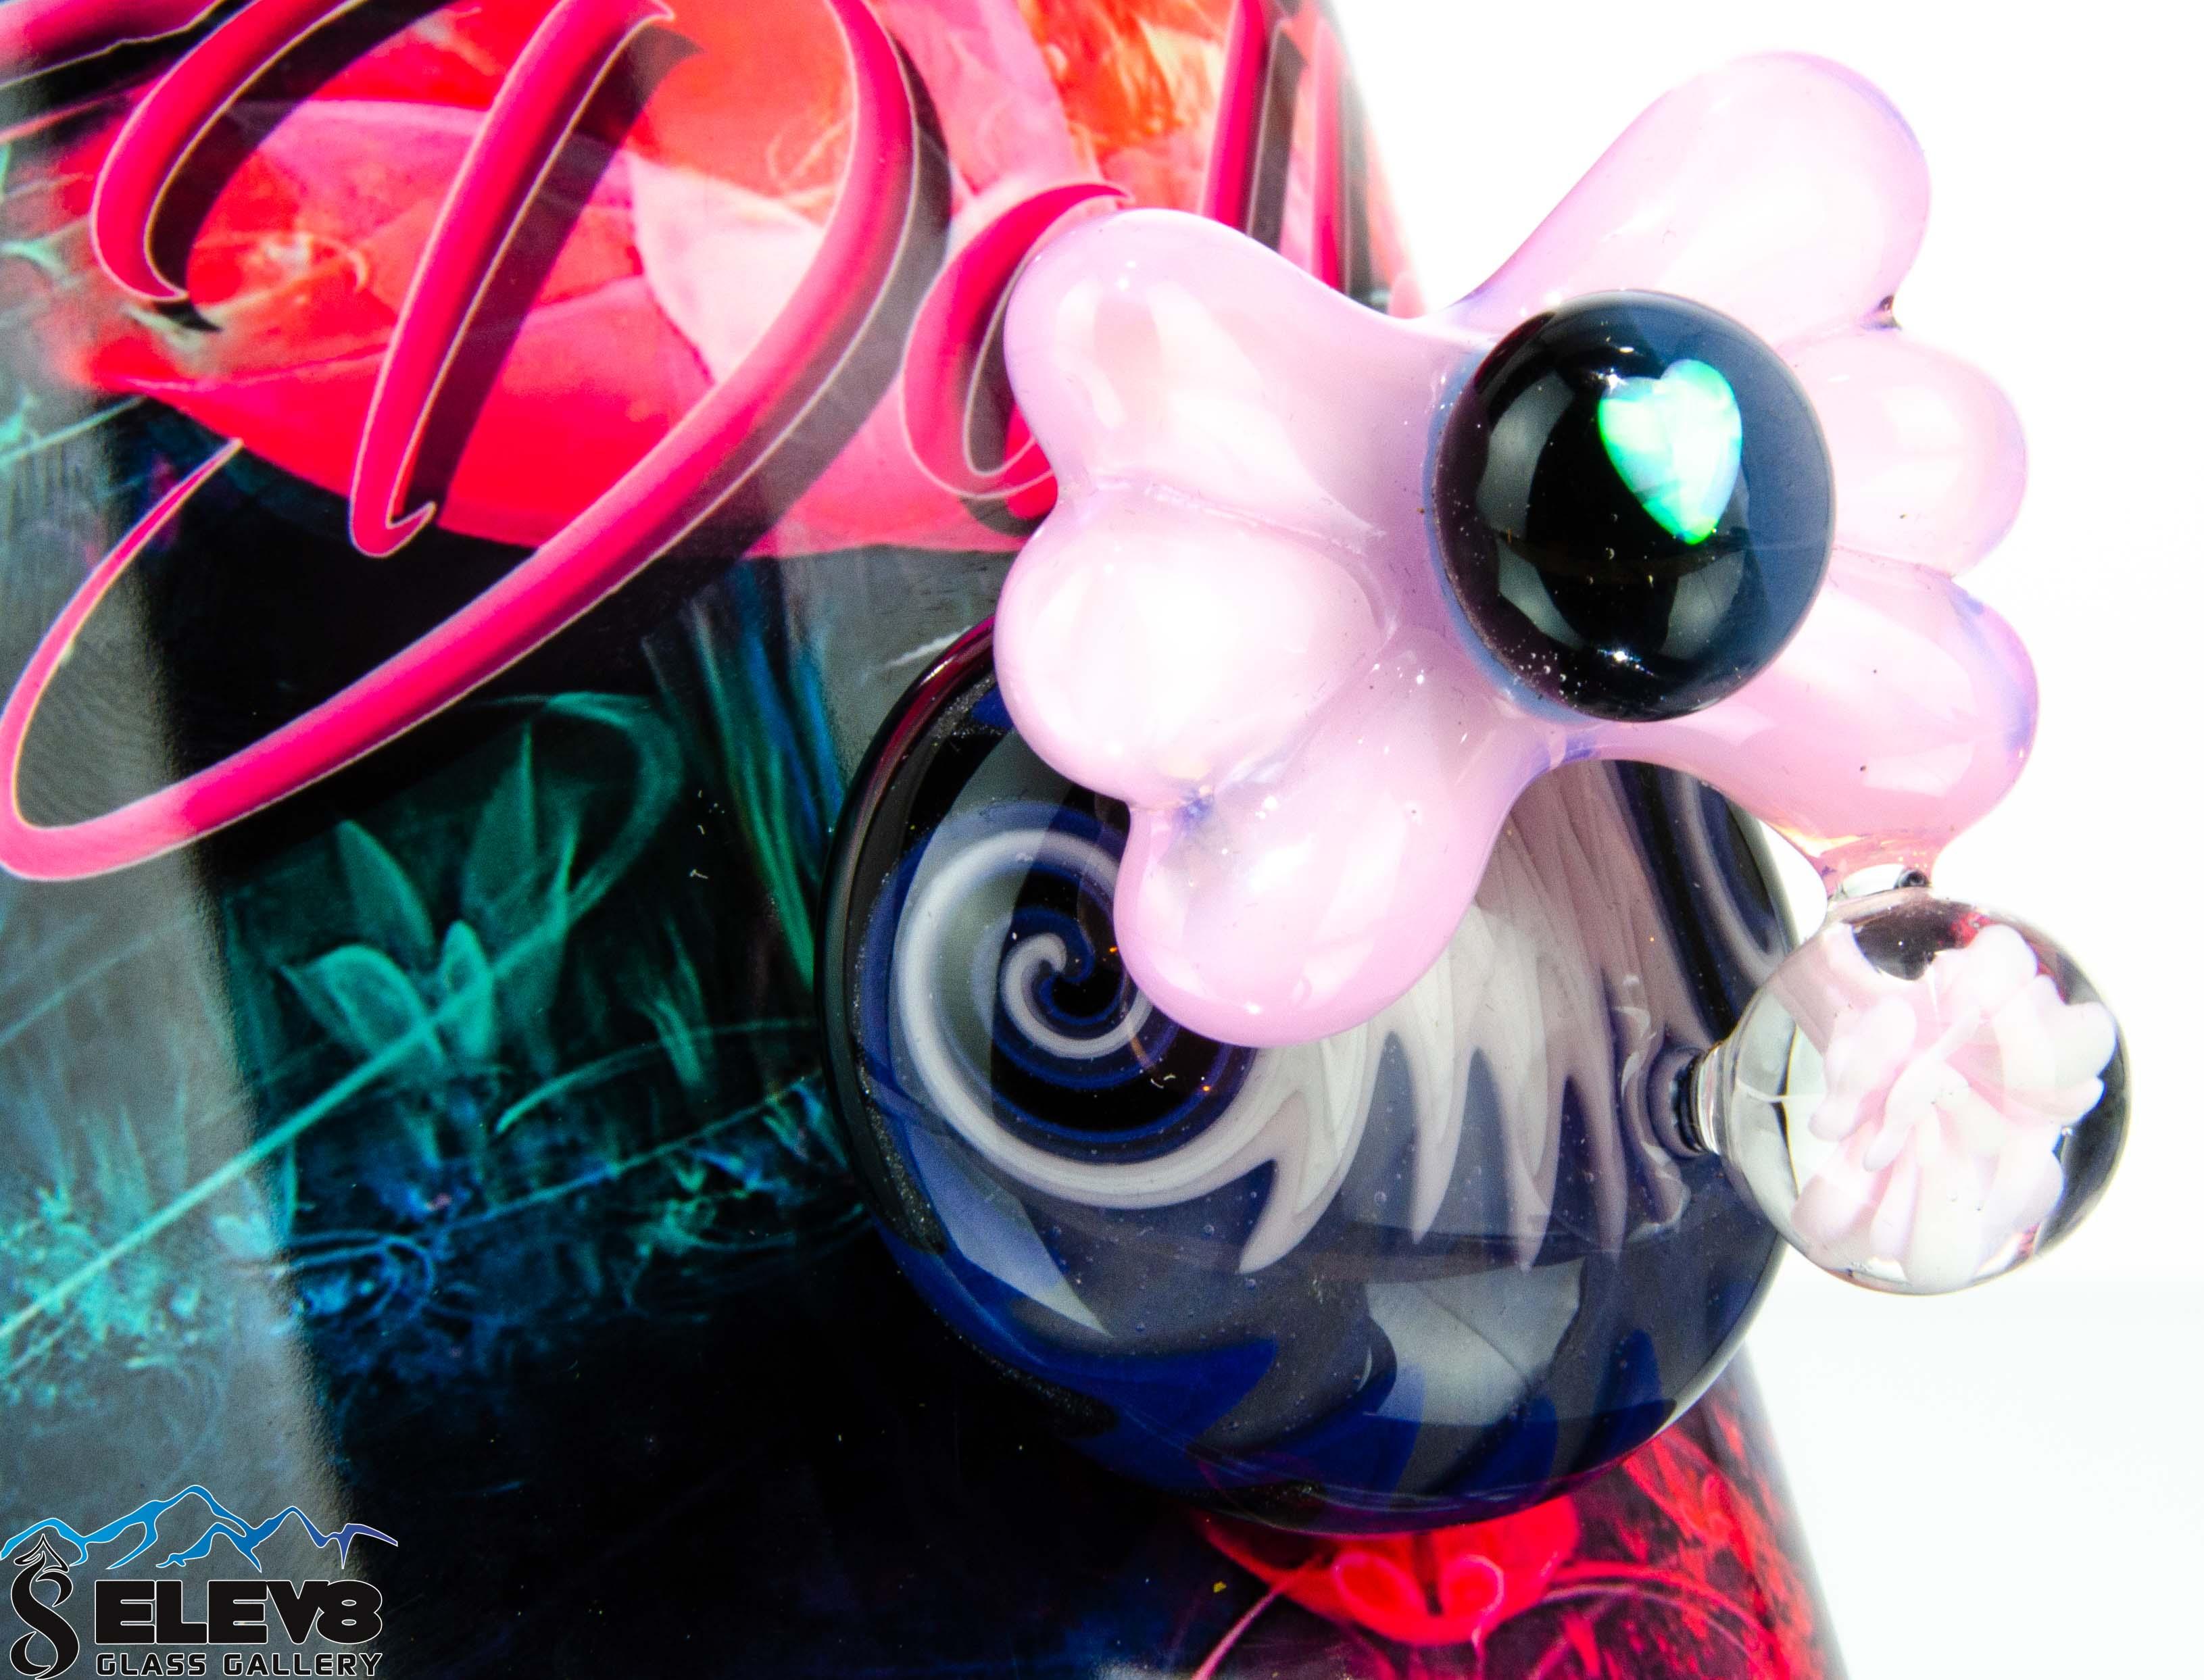 steve-k-and-elev8-dolls-vaporizer-knob.jpg